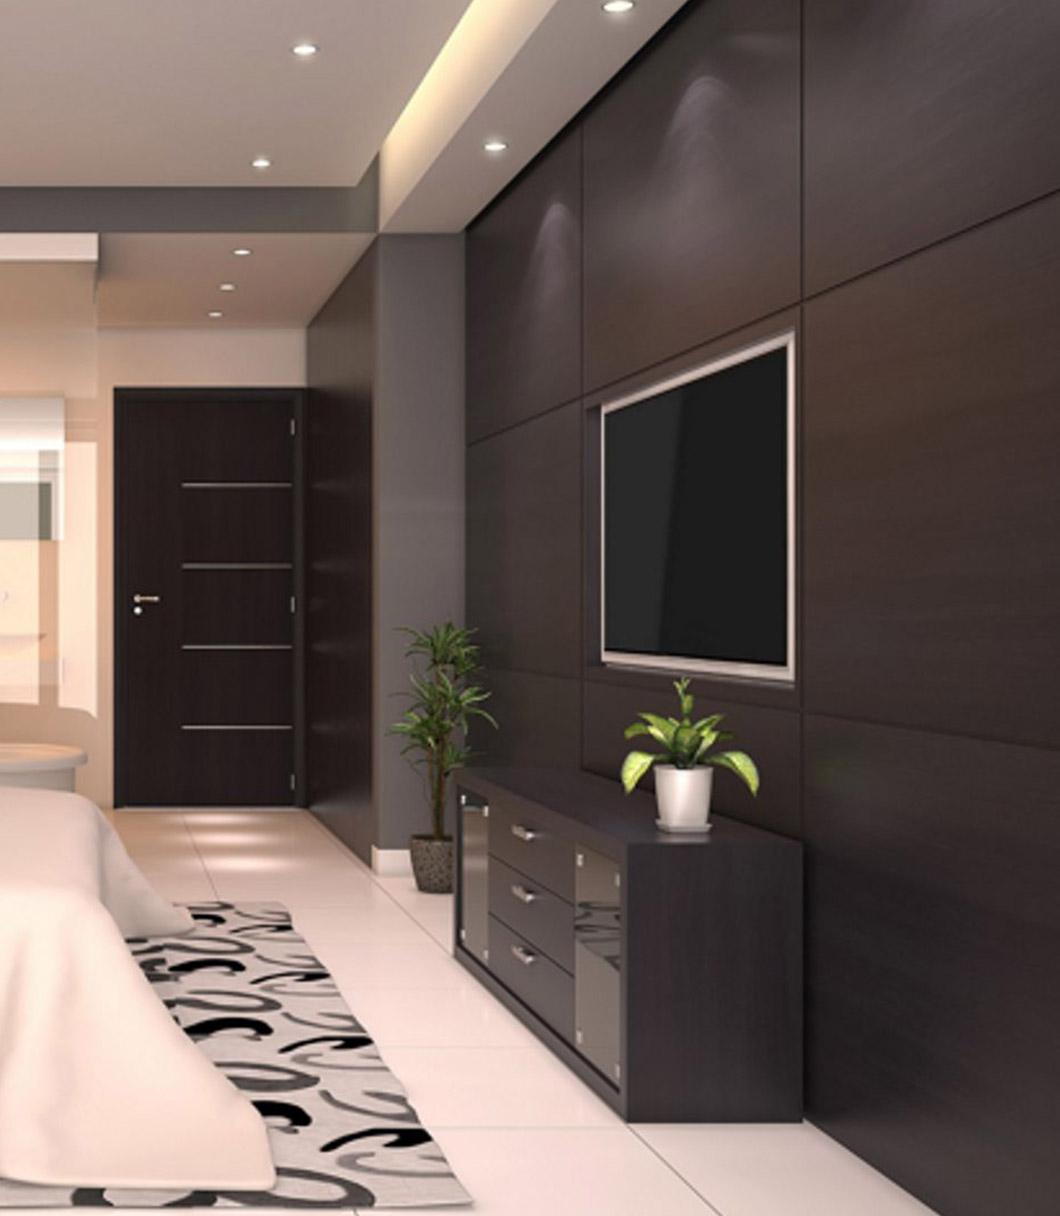 1-hantverkarpoolen interior meble hotelowe www